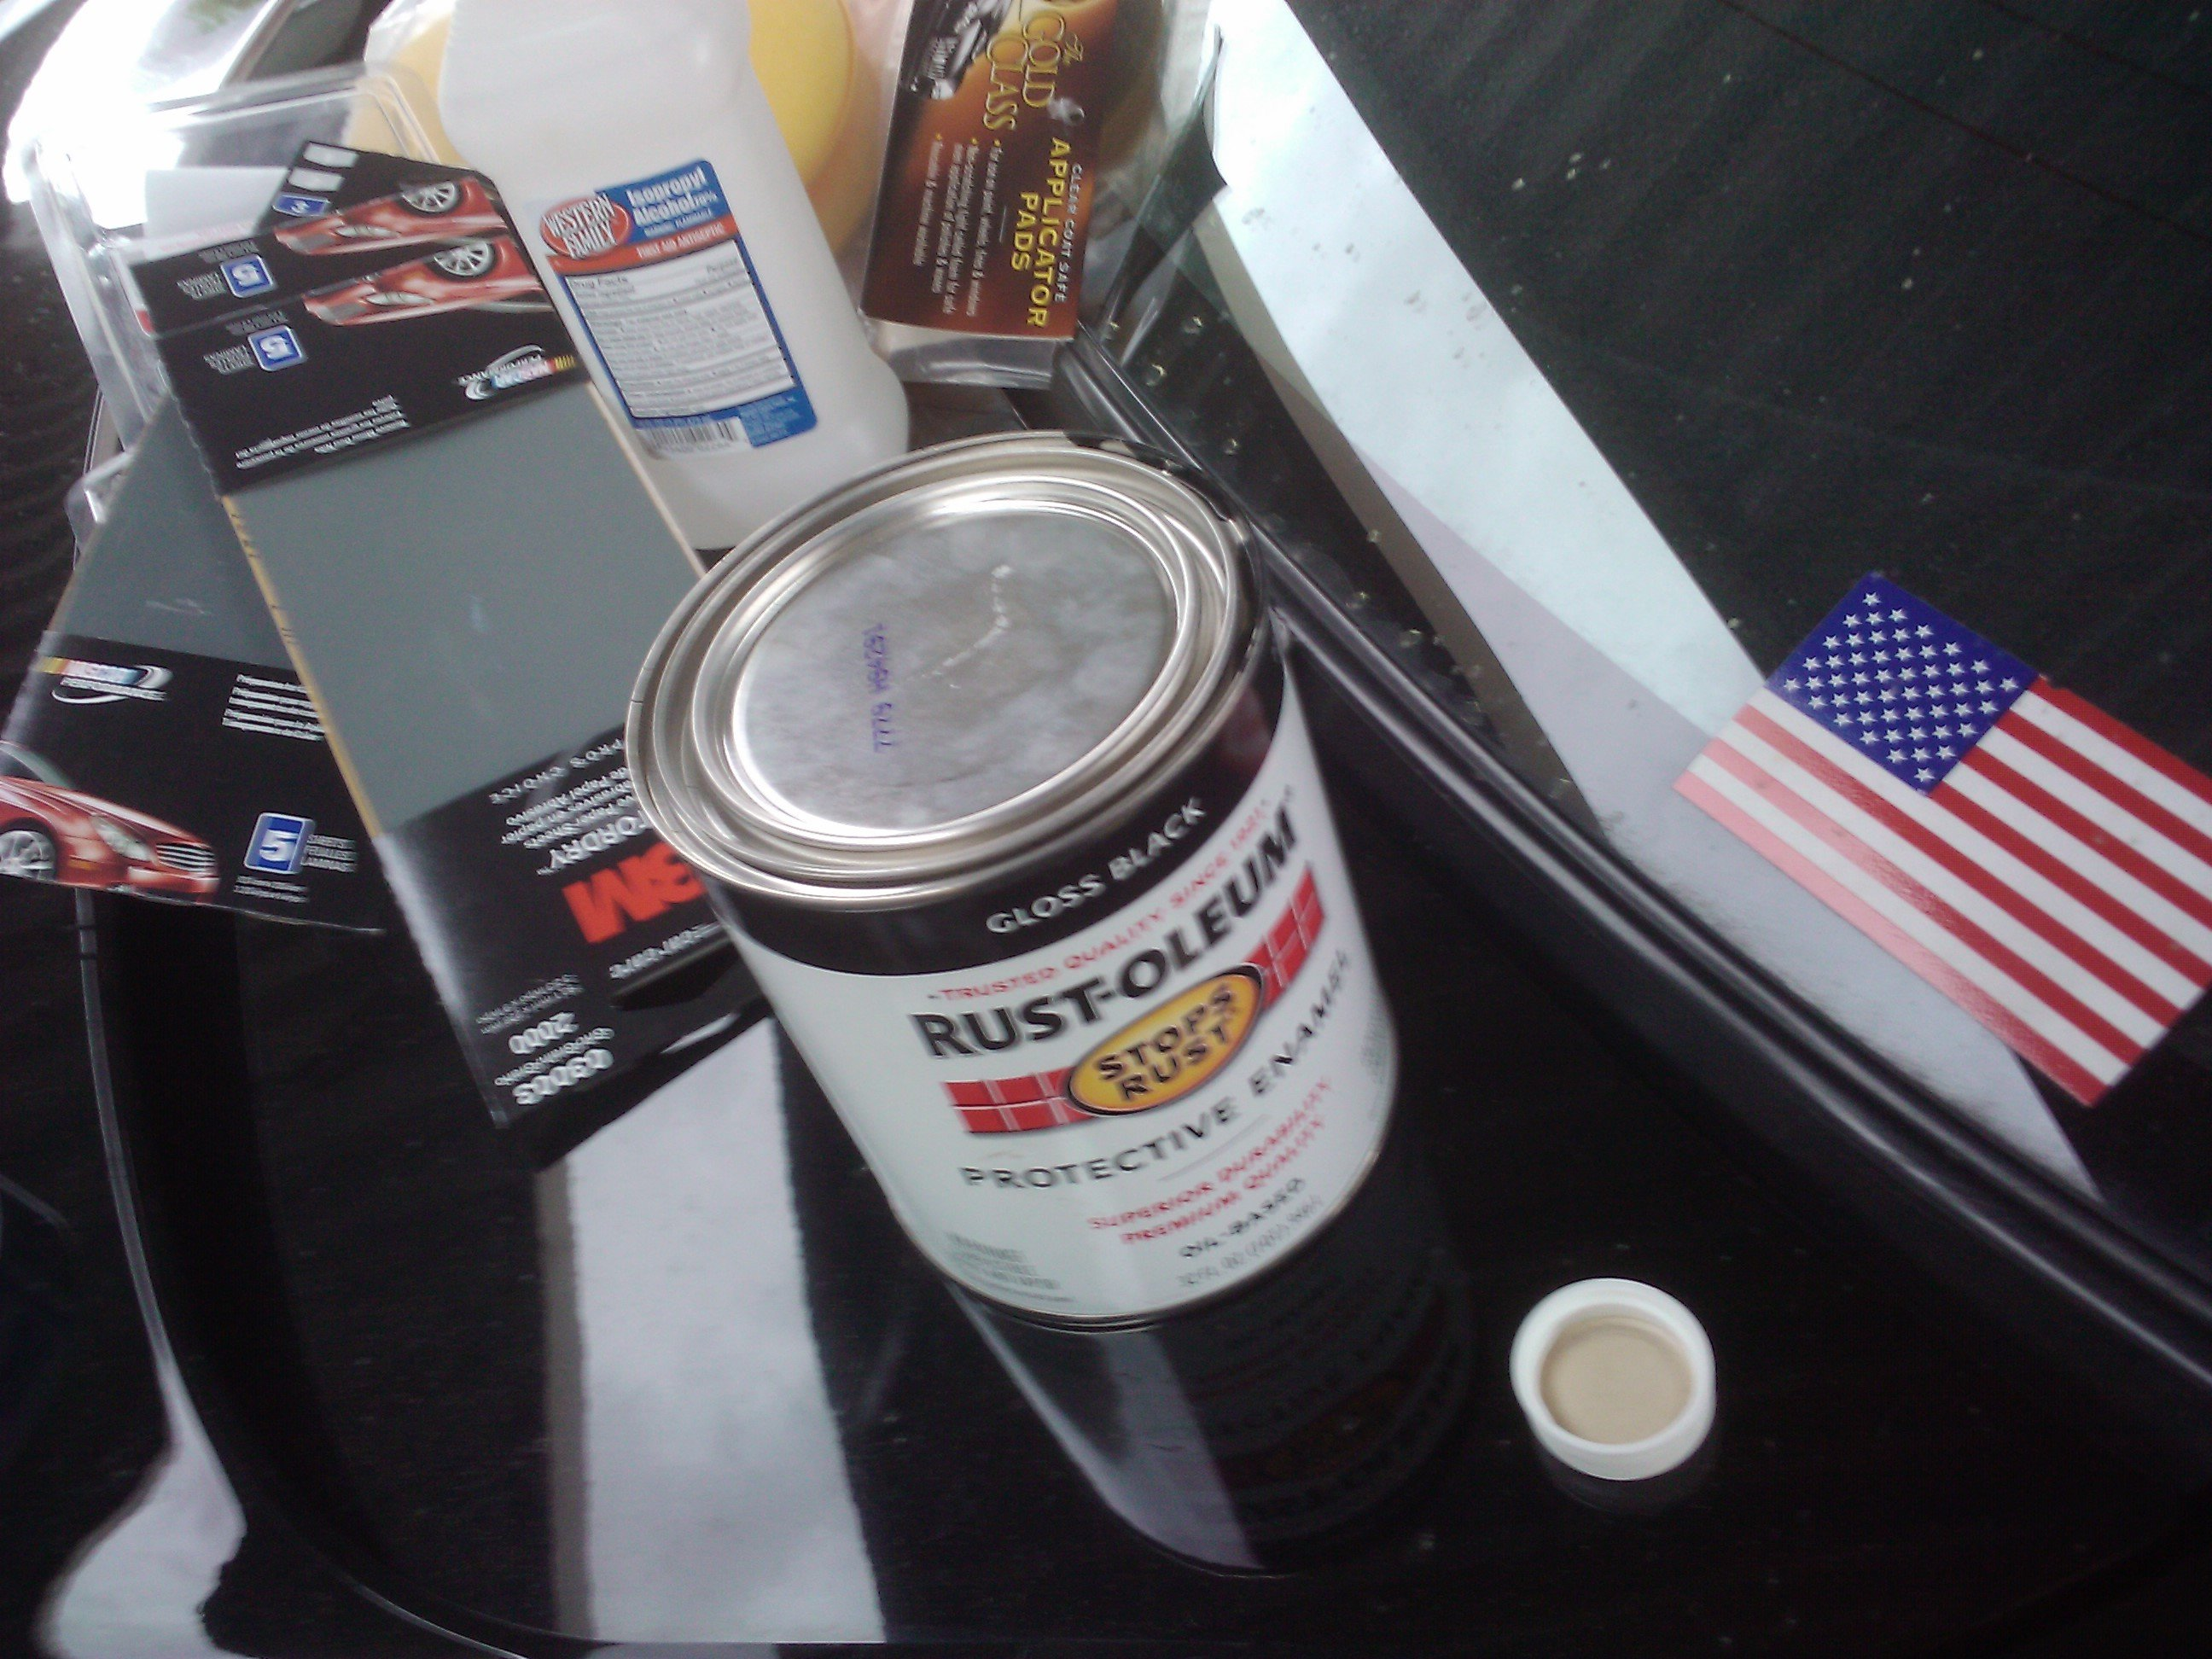 Rust-oleum $30.00 scratch fix... - Ford Mustang Forum